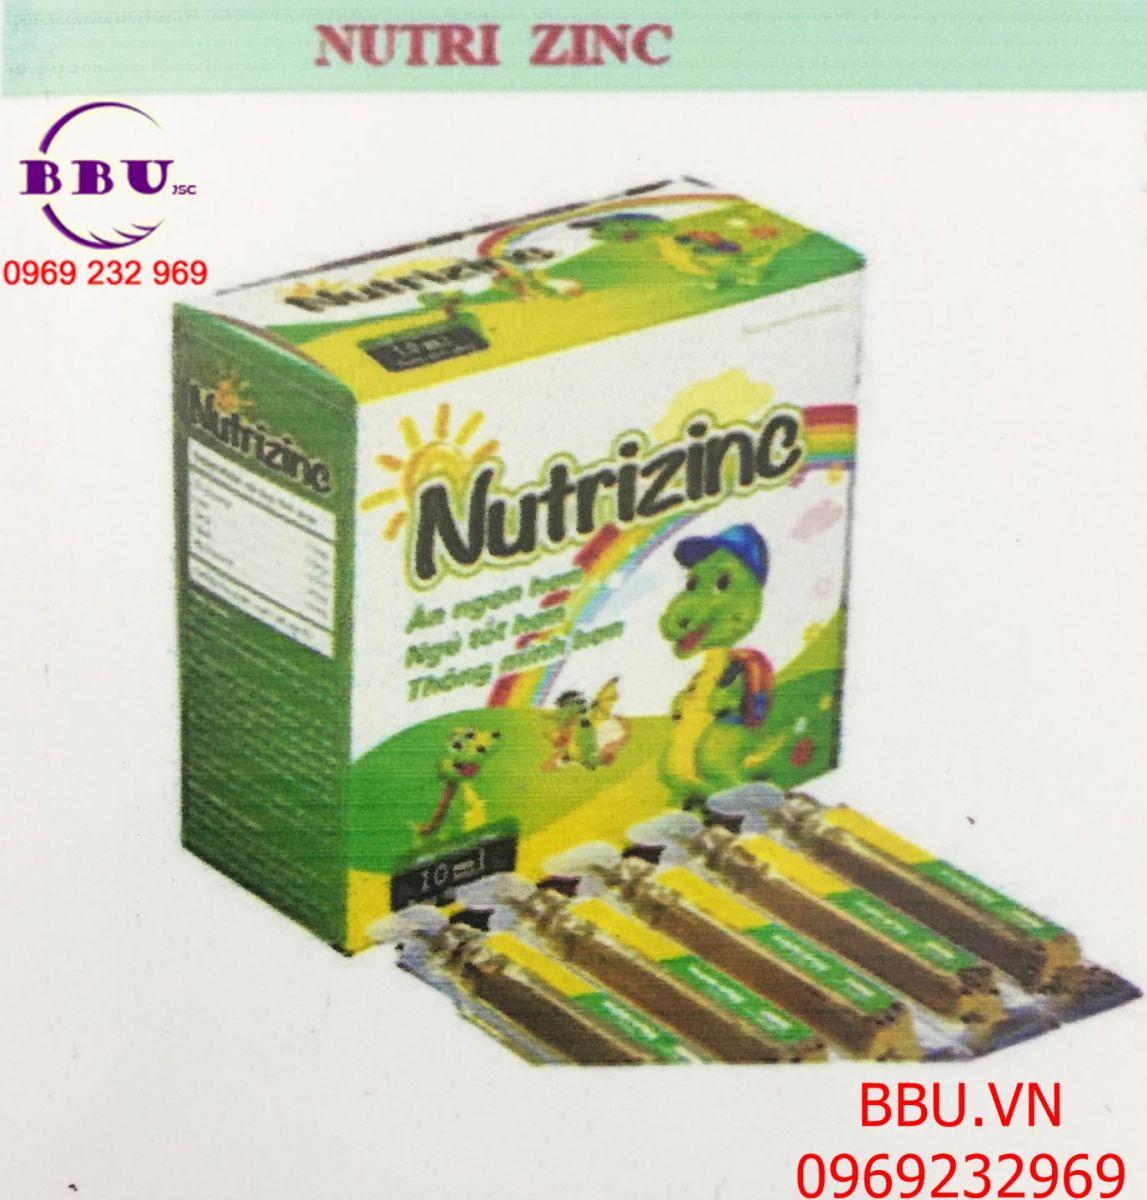 nutrizinc-bo-sung-kem-phat-trien-tri-nao-tang-cuong-mien-dich